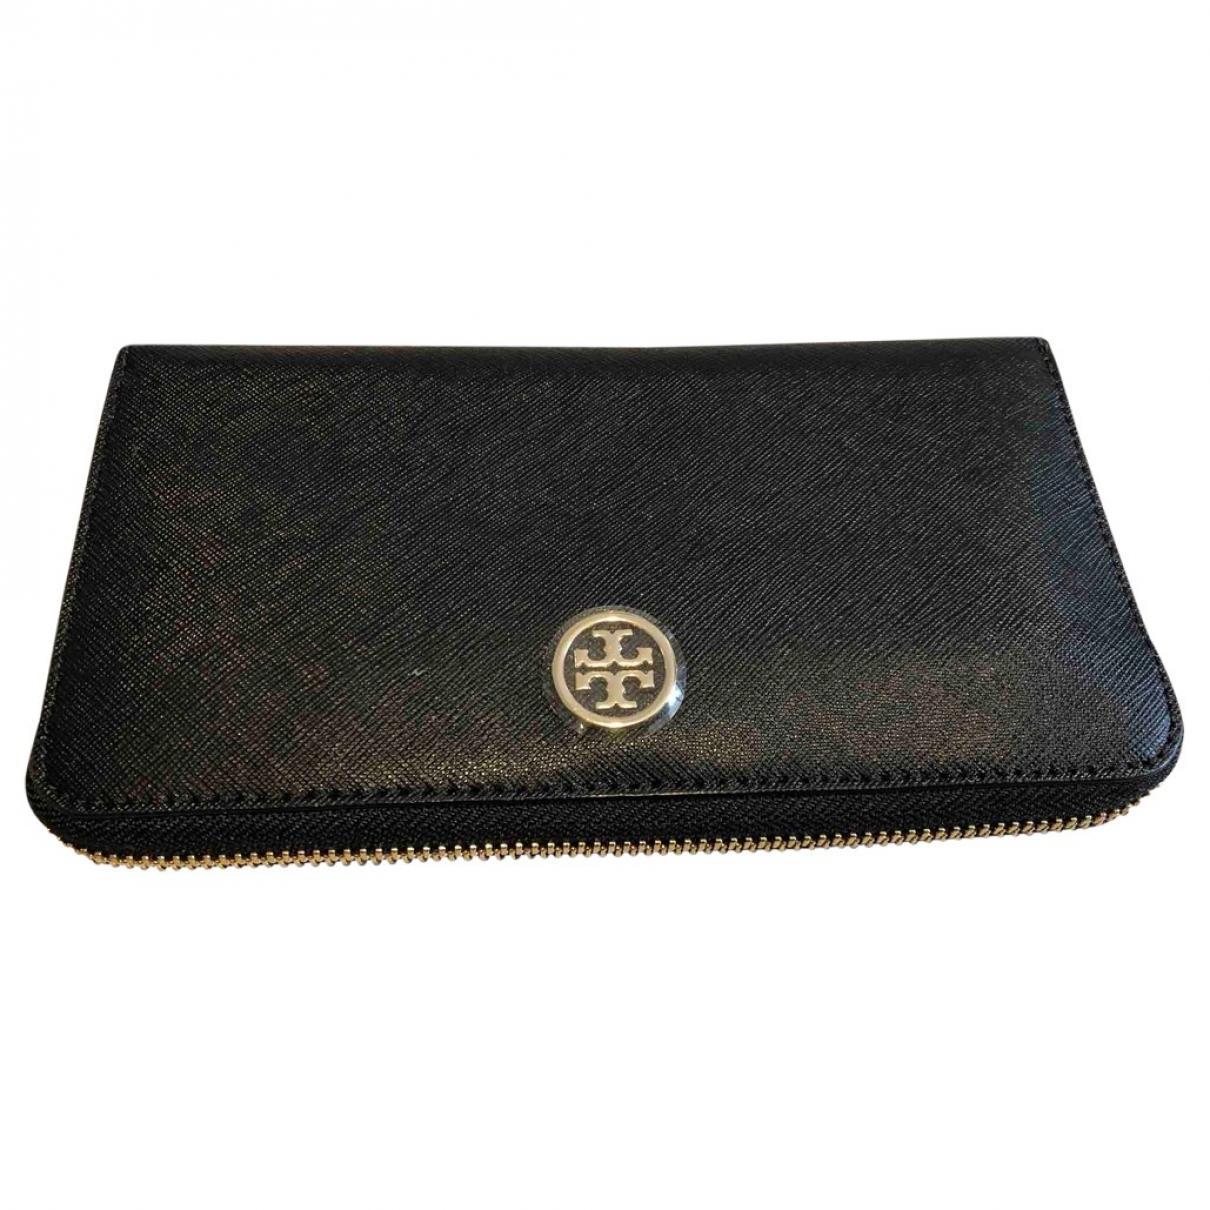 Tory Burch \N Black Leather wallet for Women \N